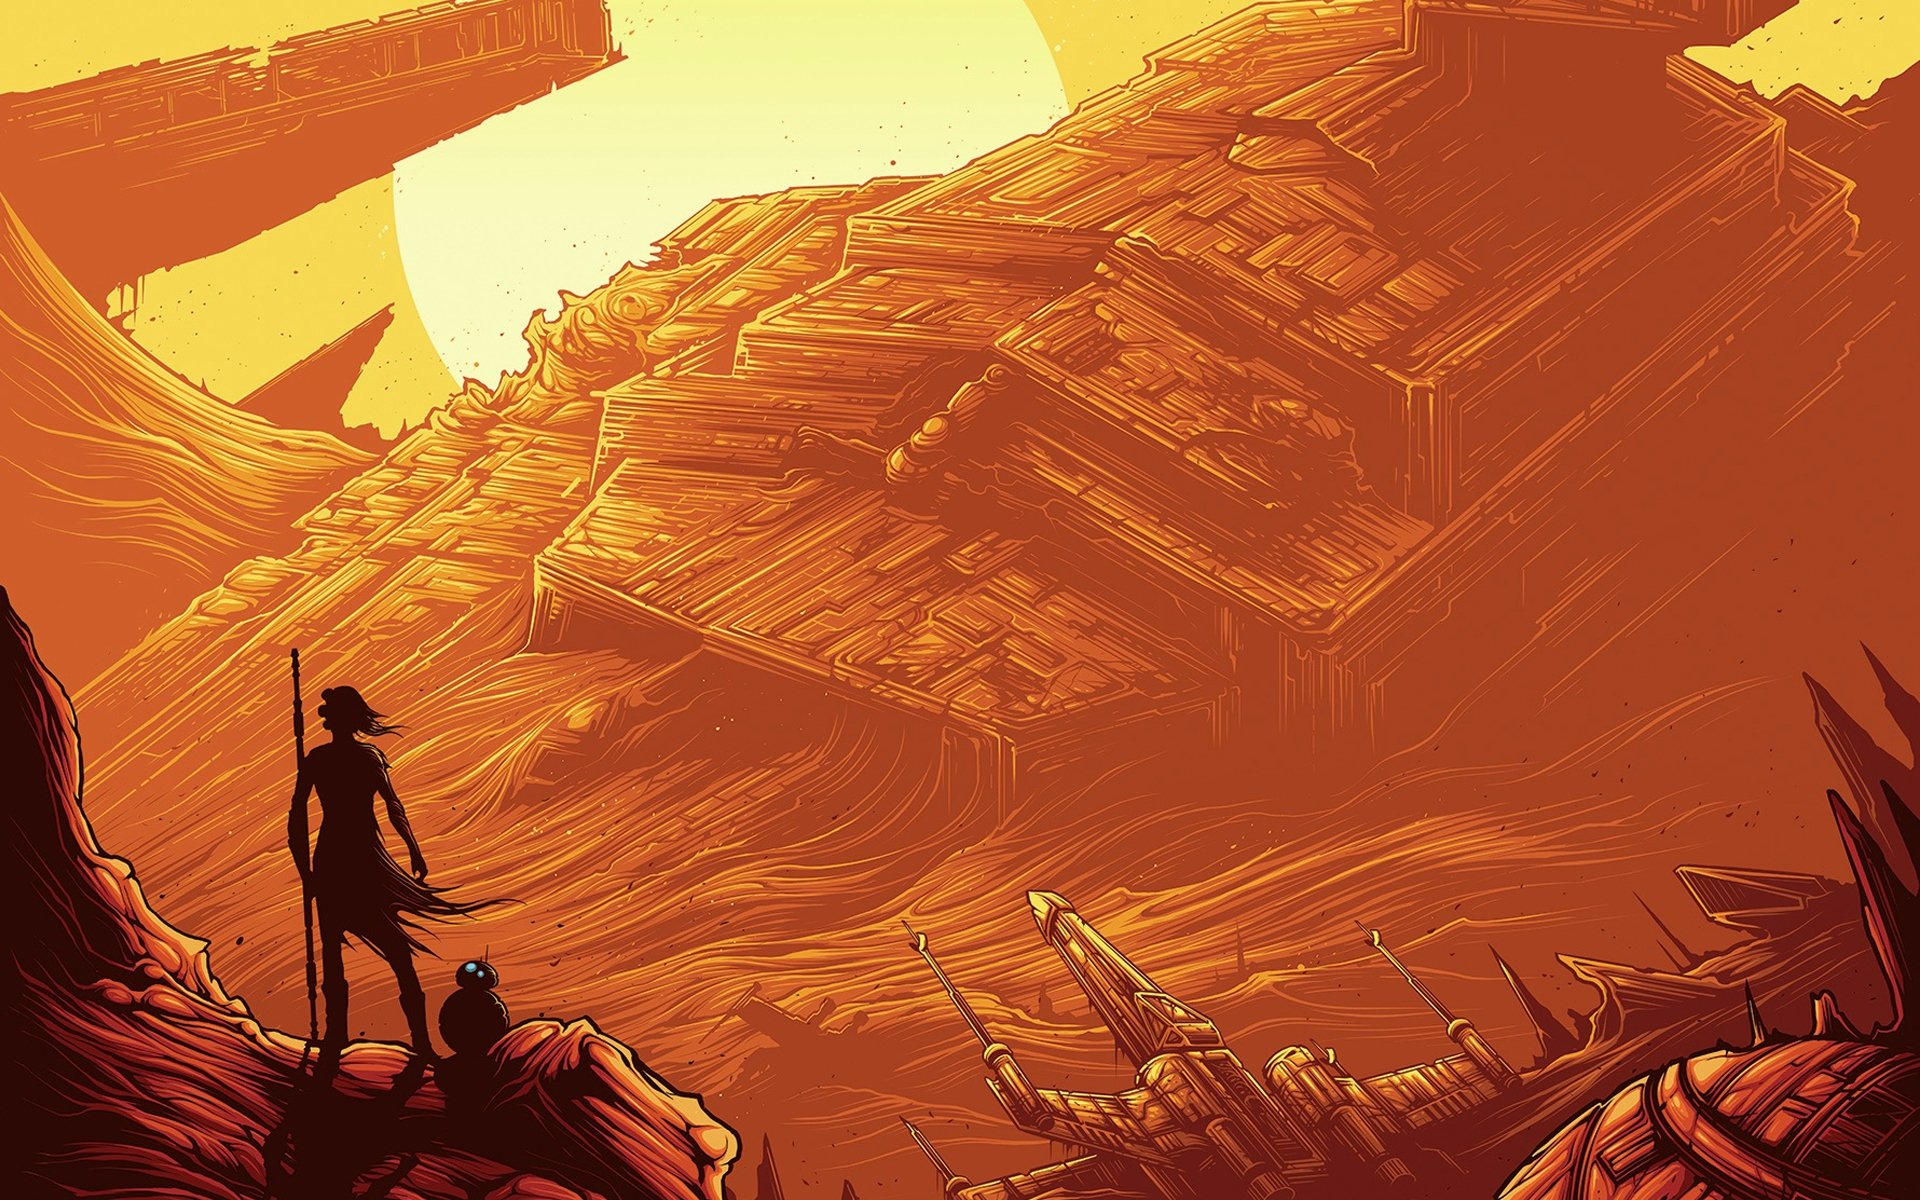 Last Jedi Wallpaper Iphone X Star Wars Episode Vii The Force Awakens Full Hd Wallpaper